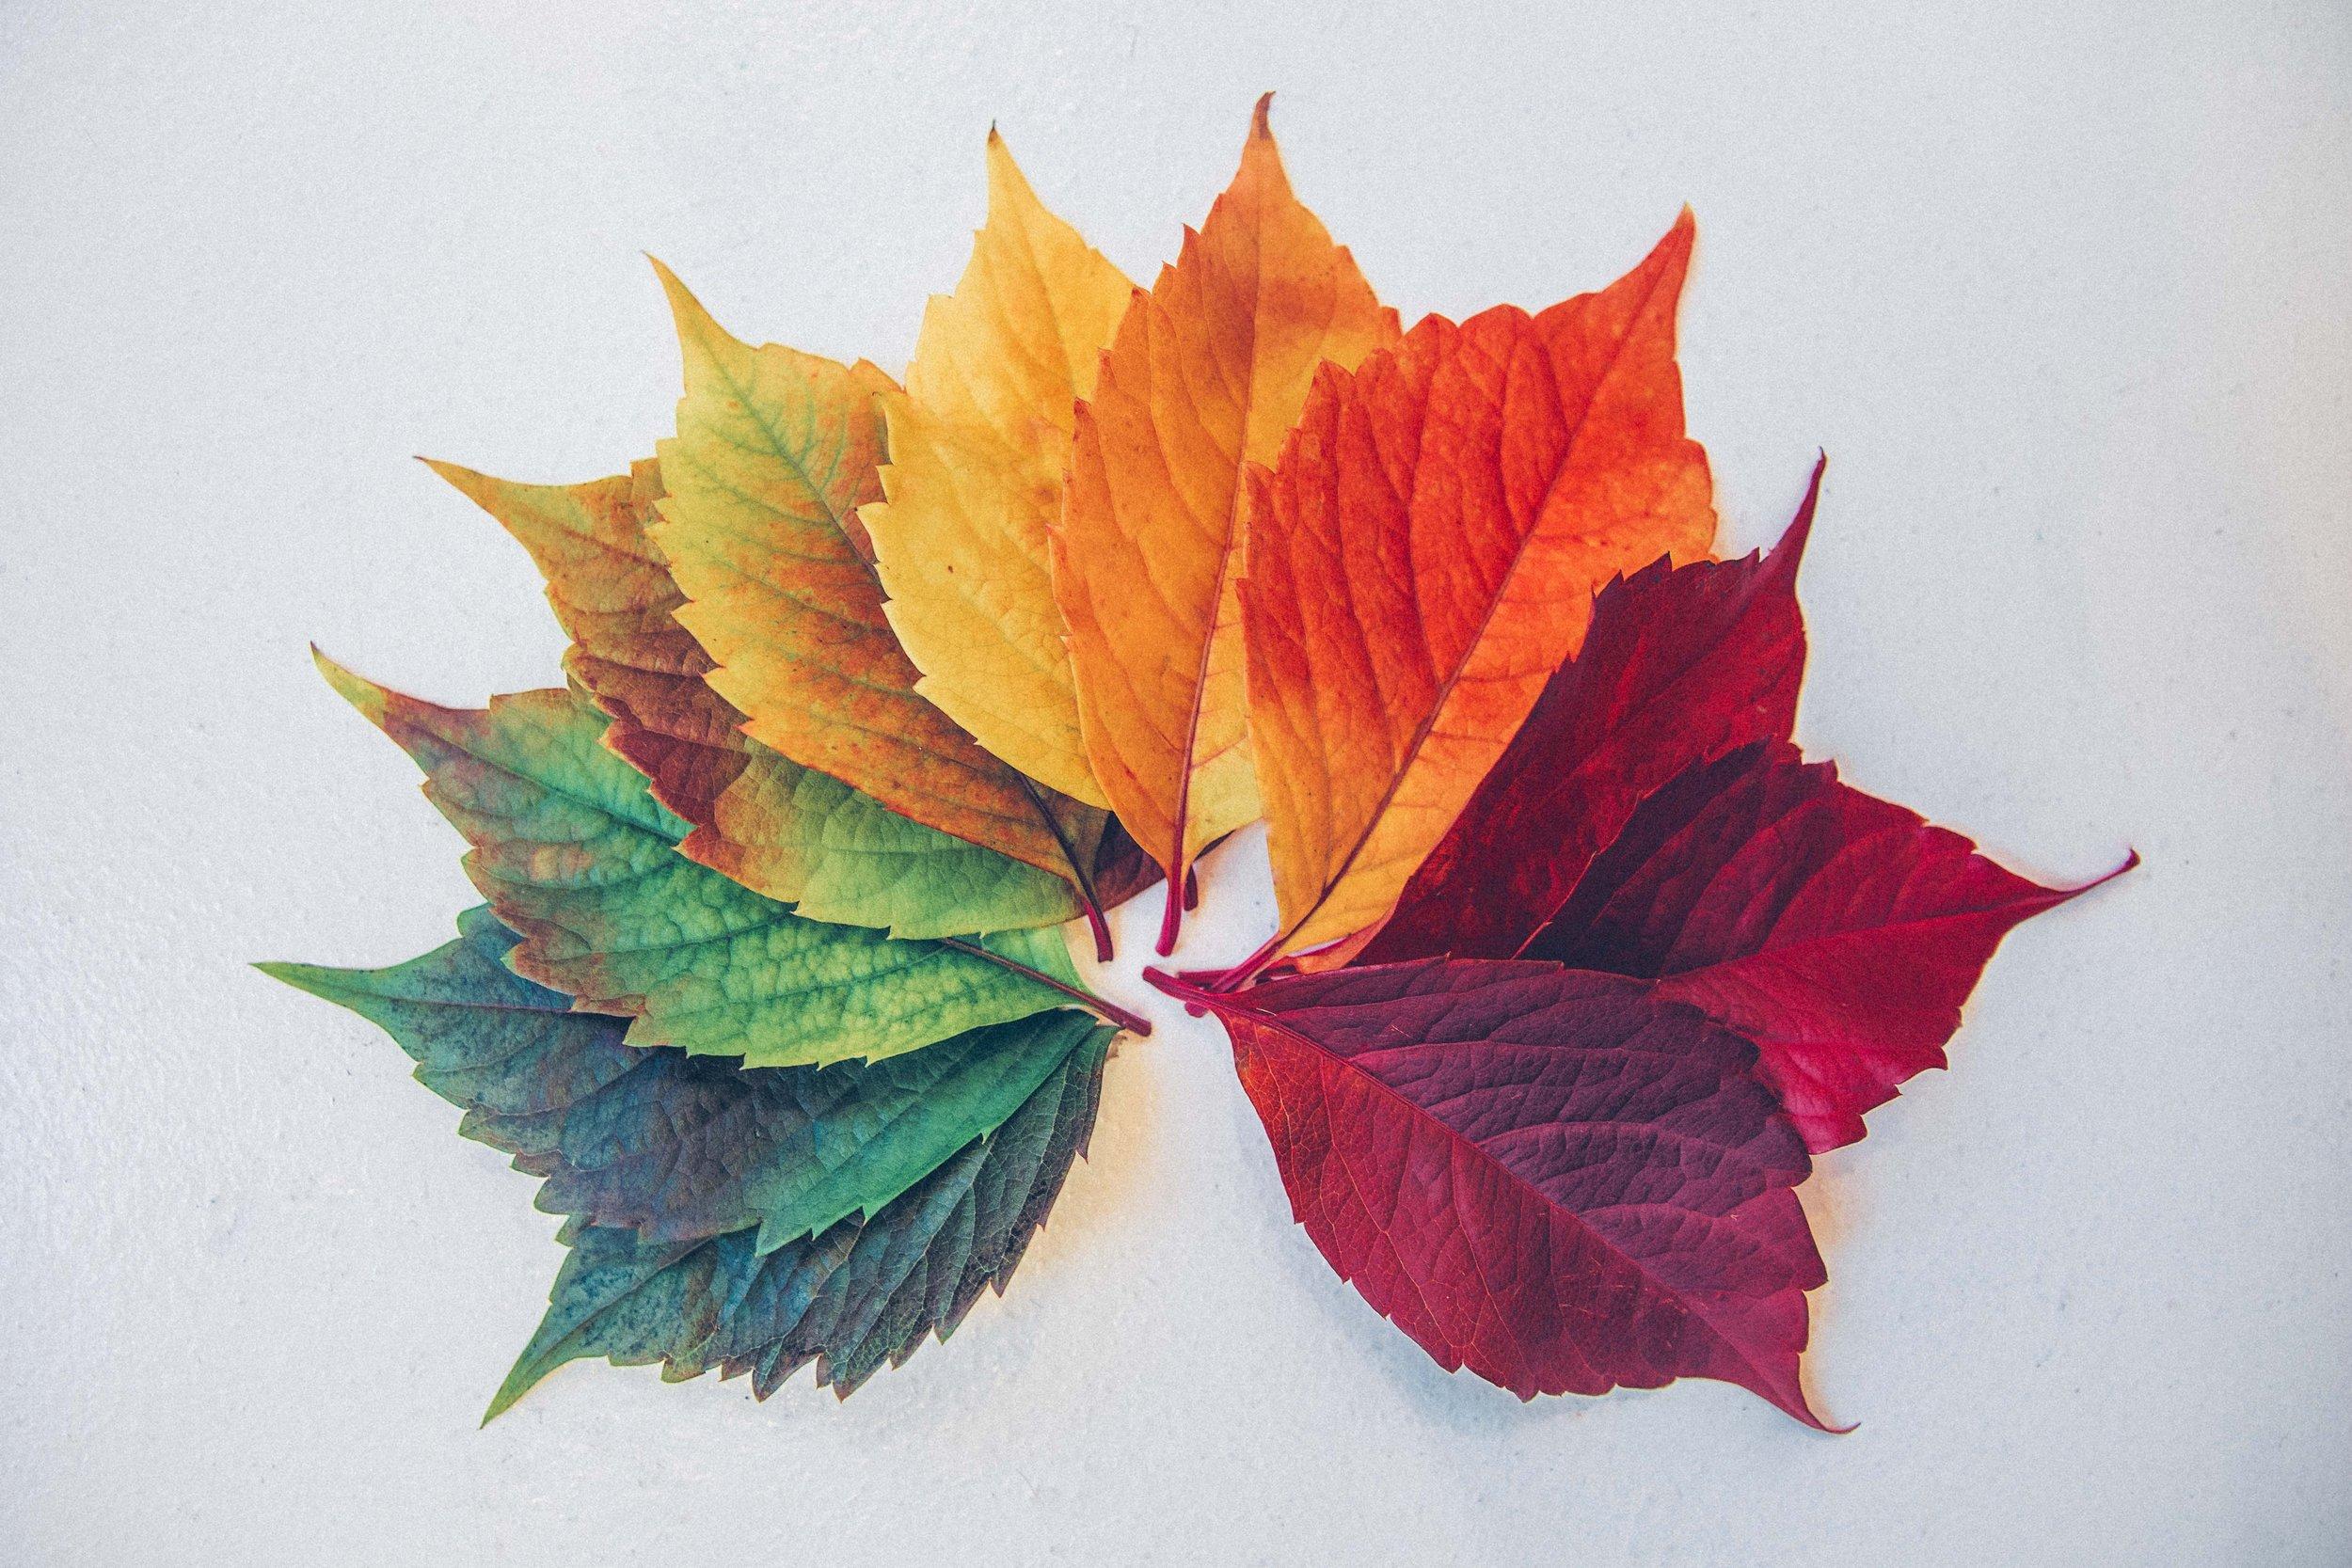 leaves_Chris_Lawton_Unsplash.jpg